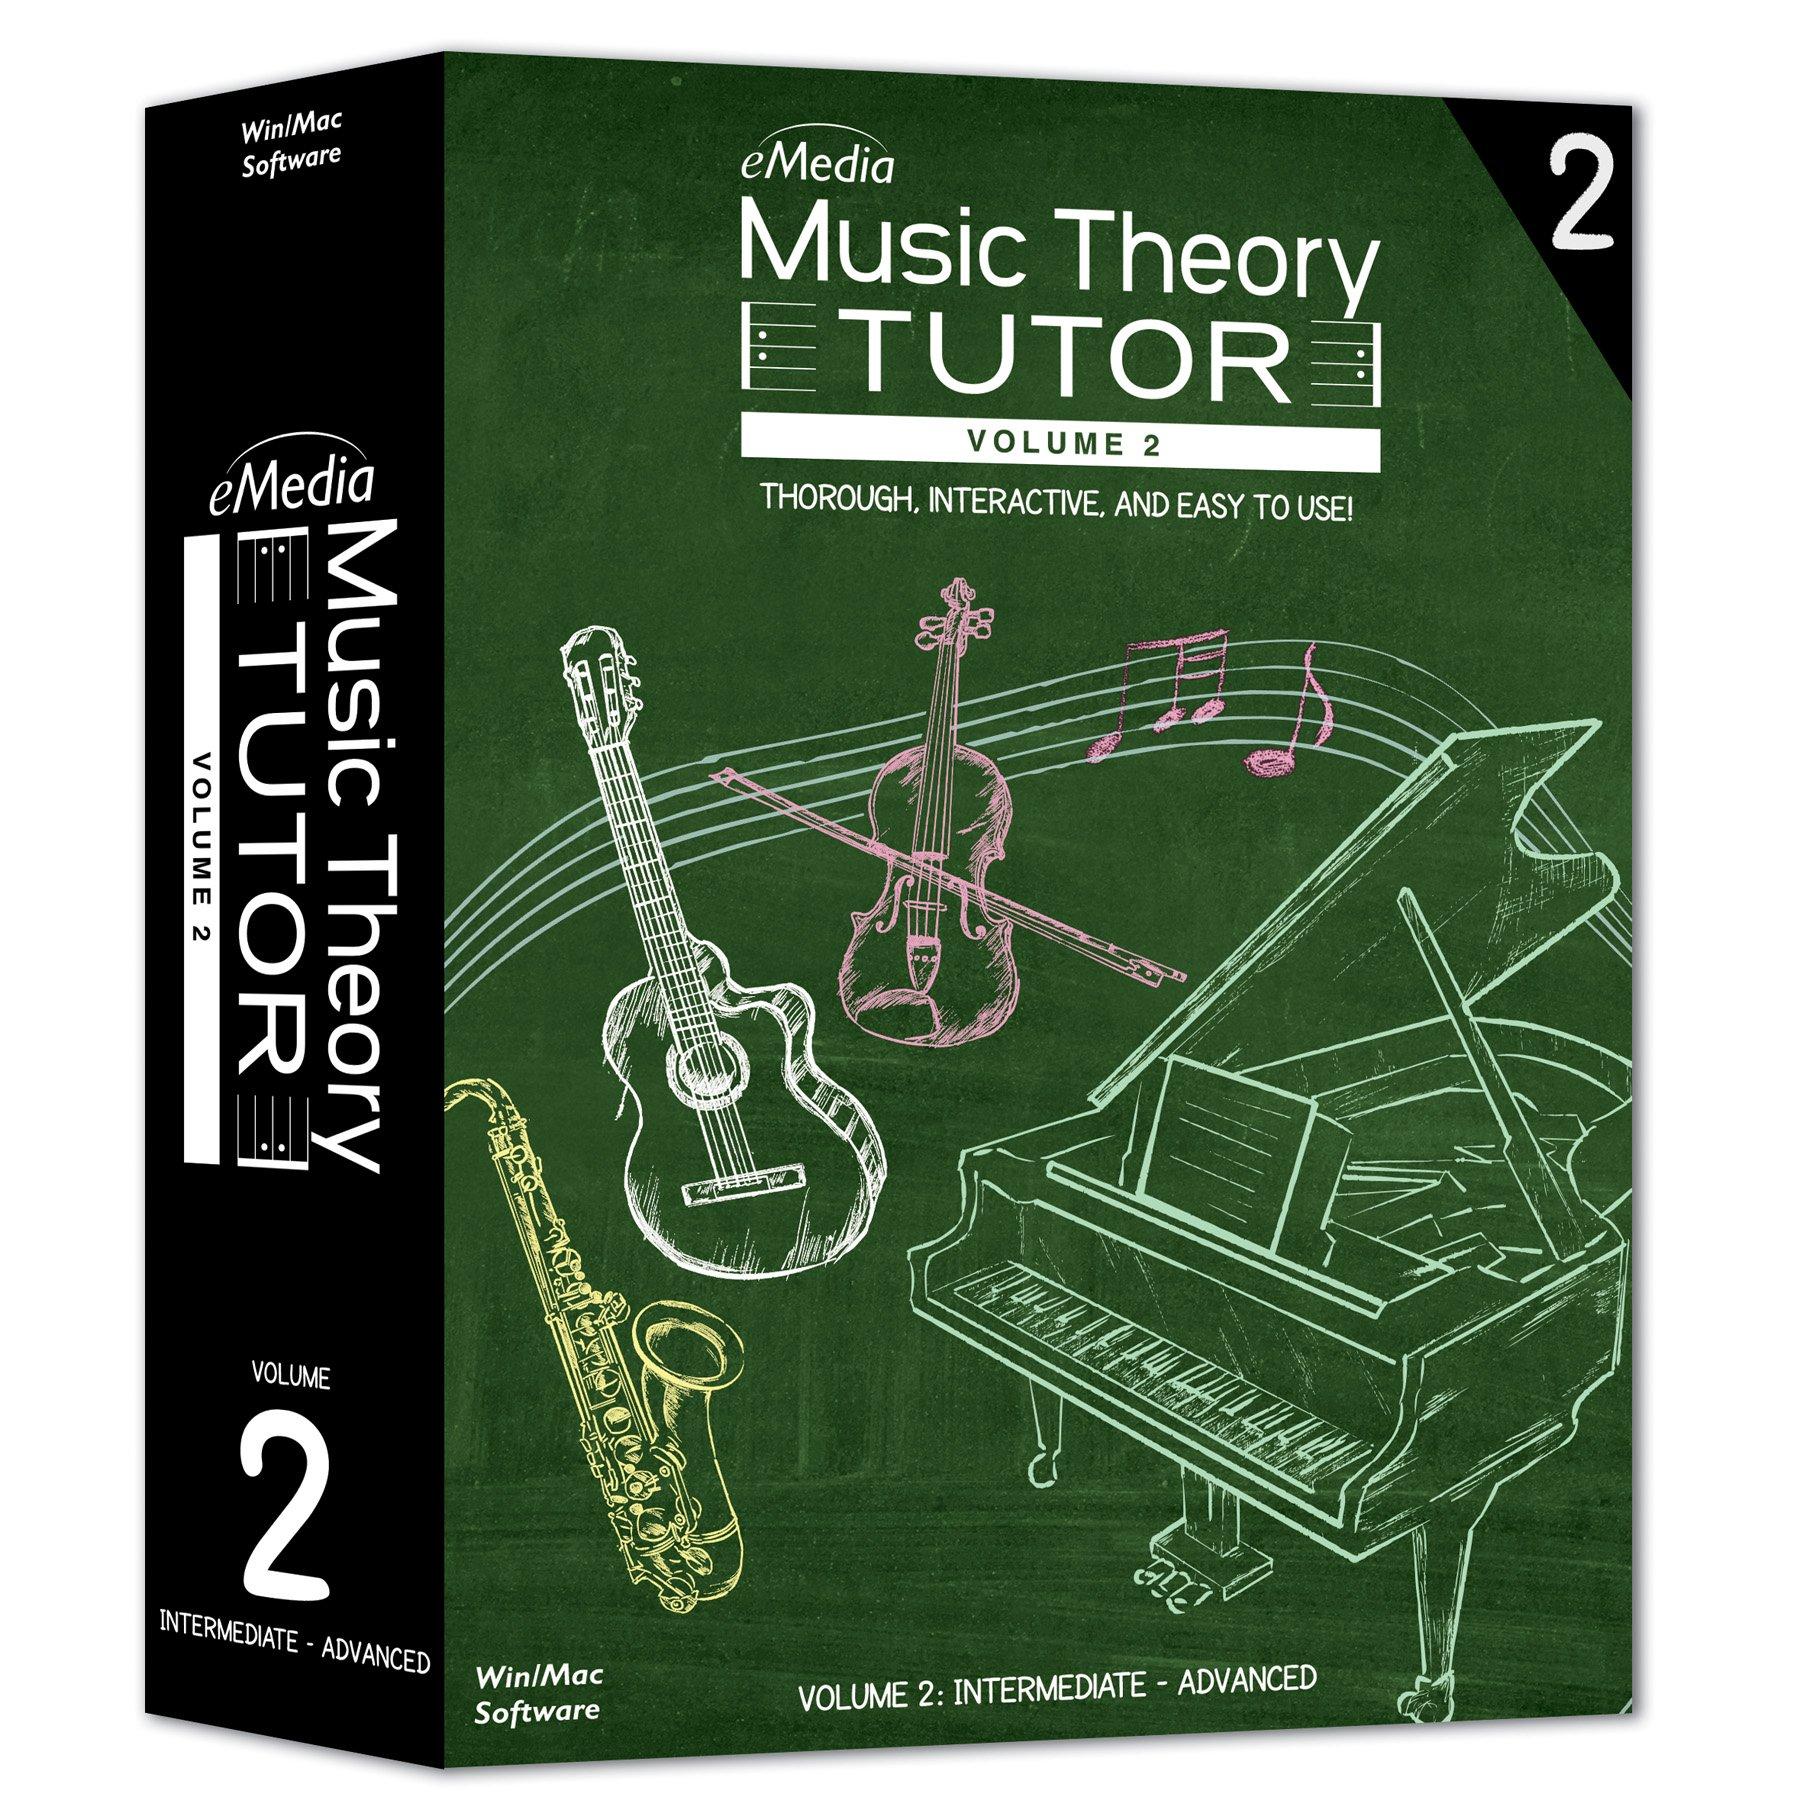 eMedia Music Theory Tutor, Volume 2 by eMedia